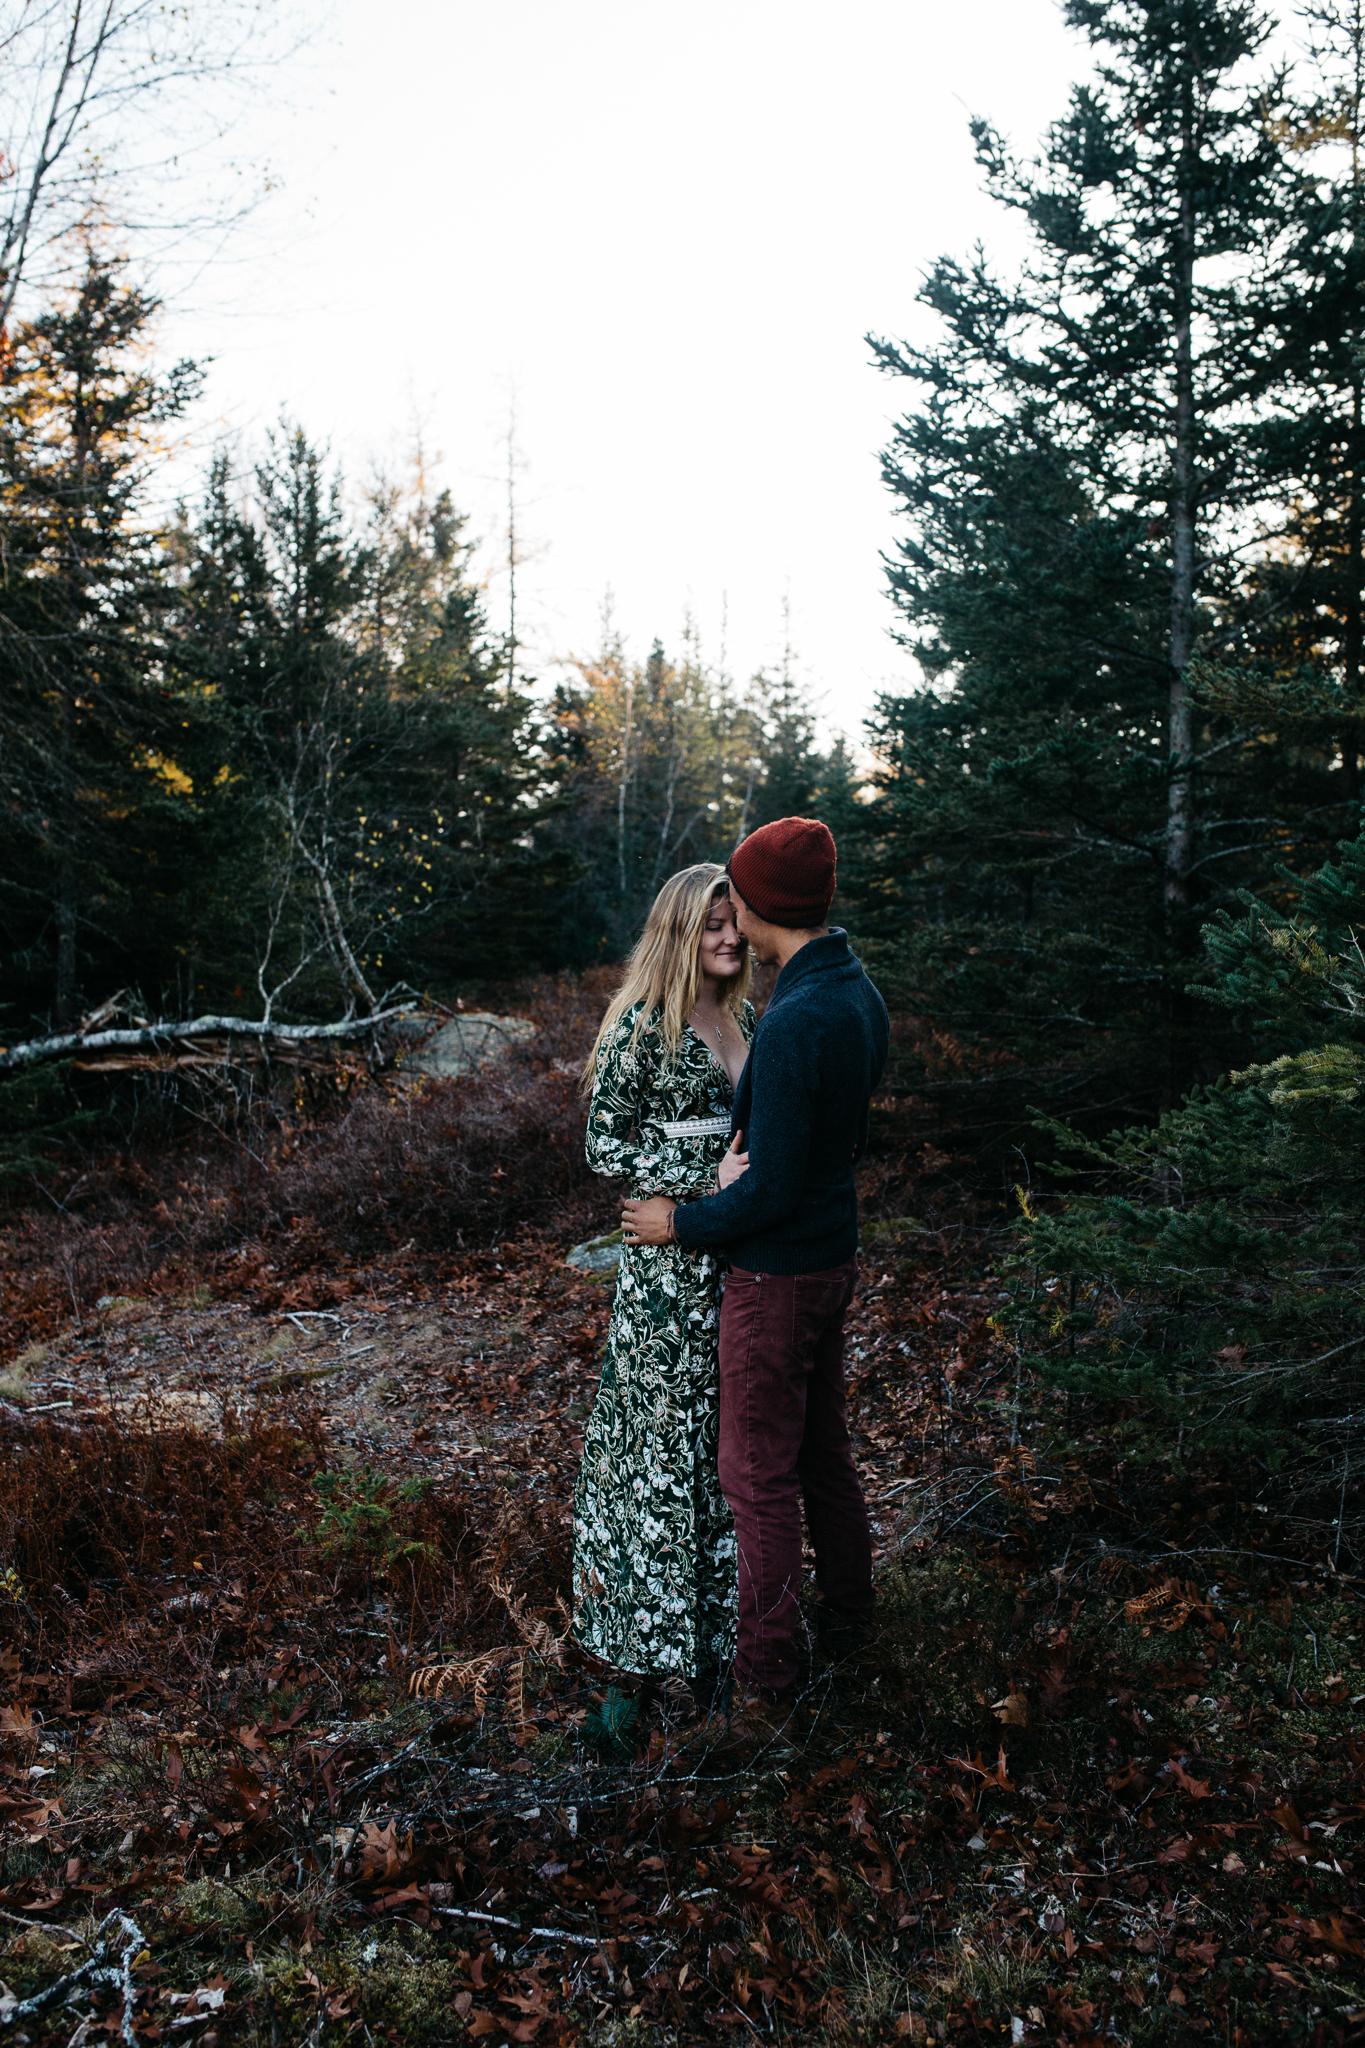 erinwheatcororyaylen-0555 Acadia National Park Lovers